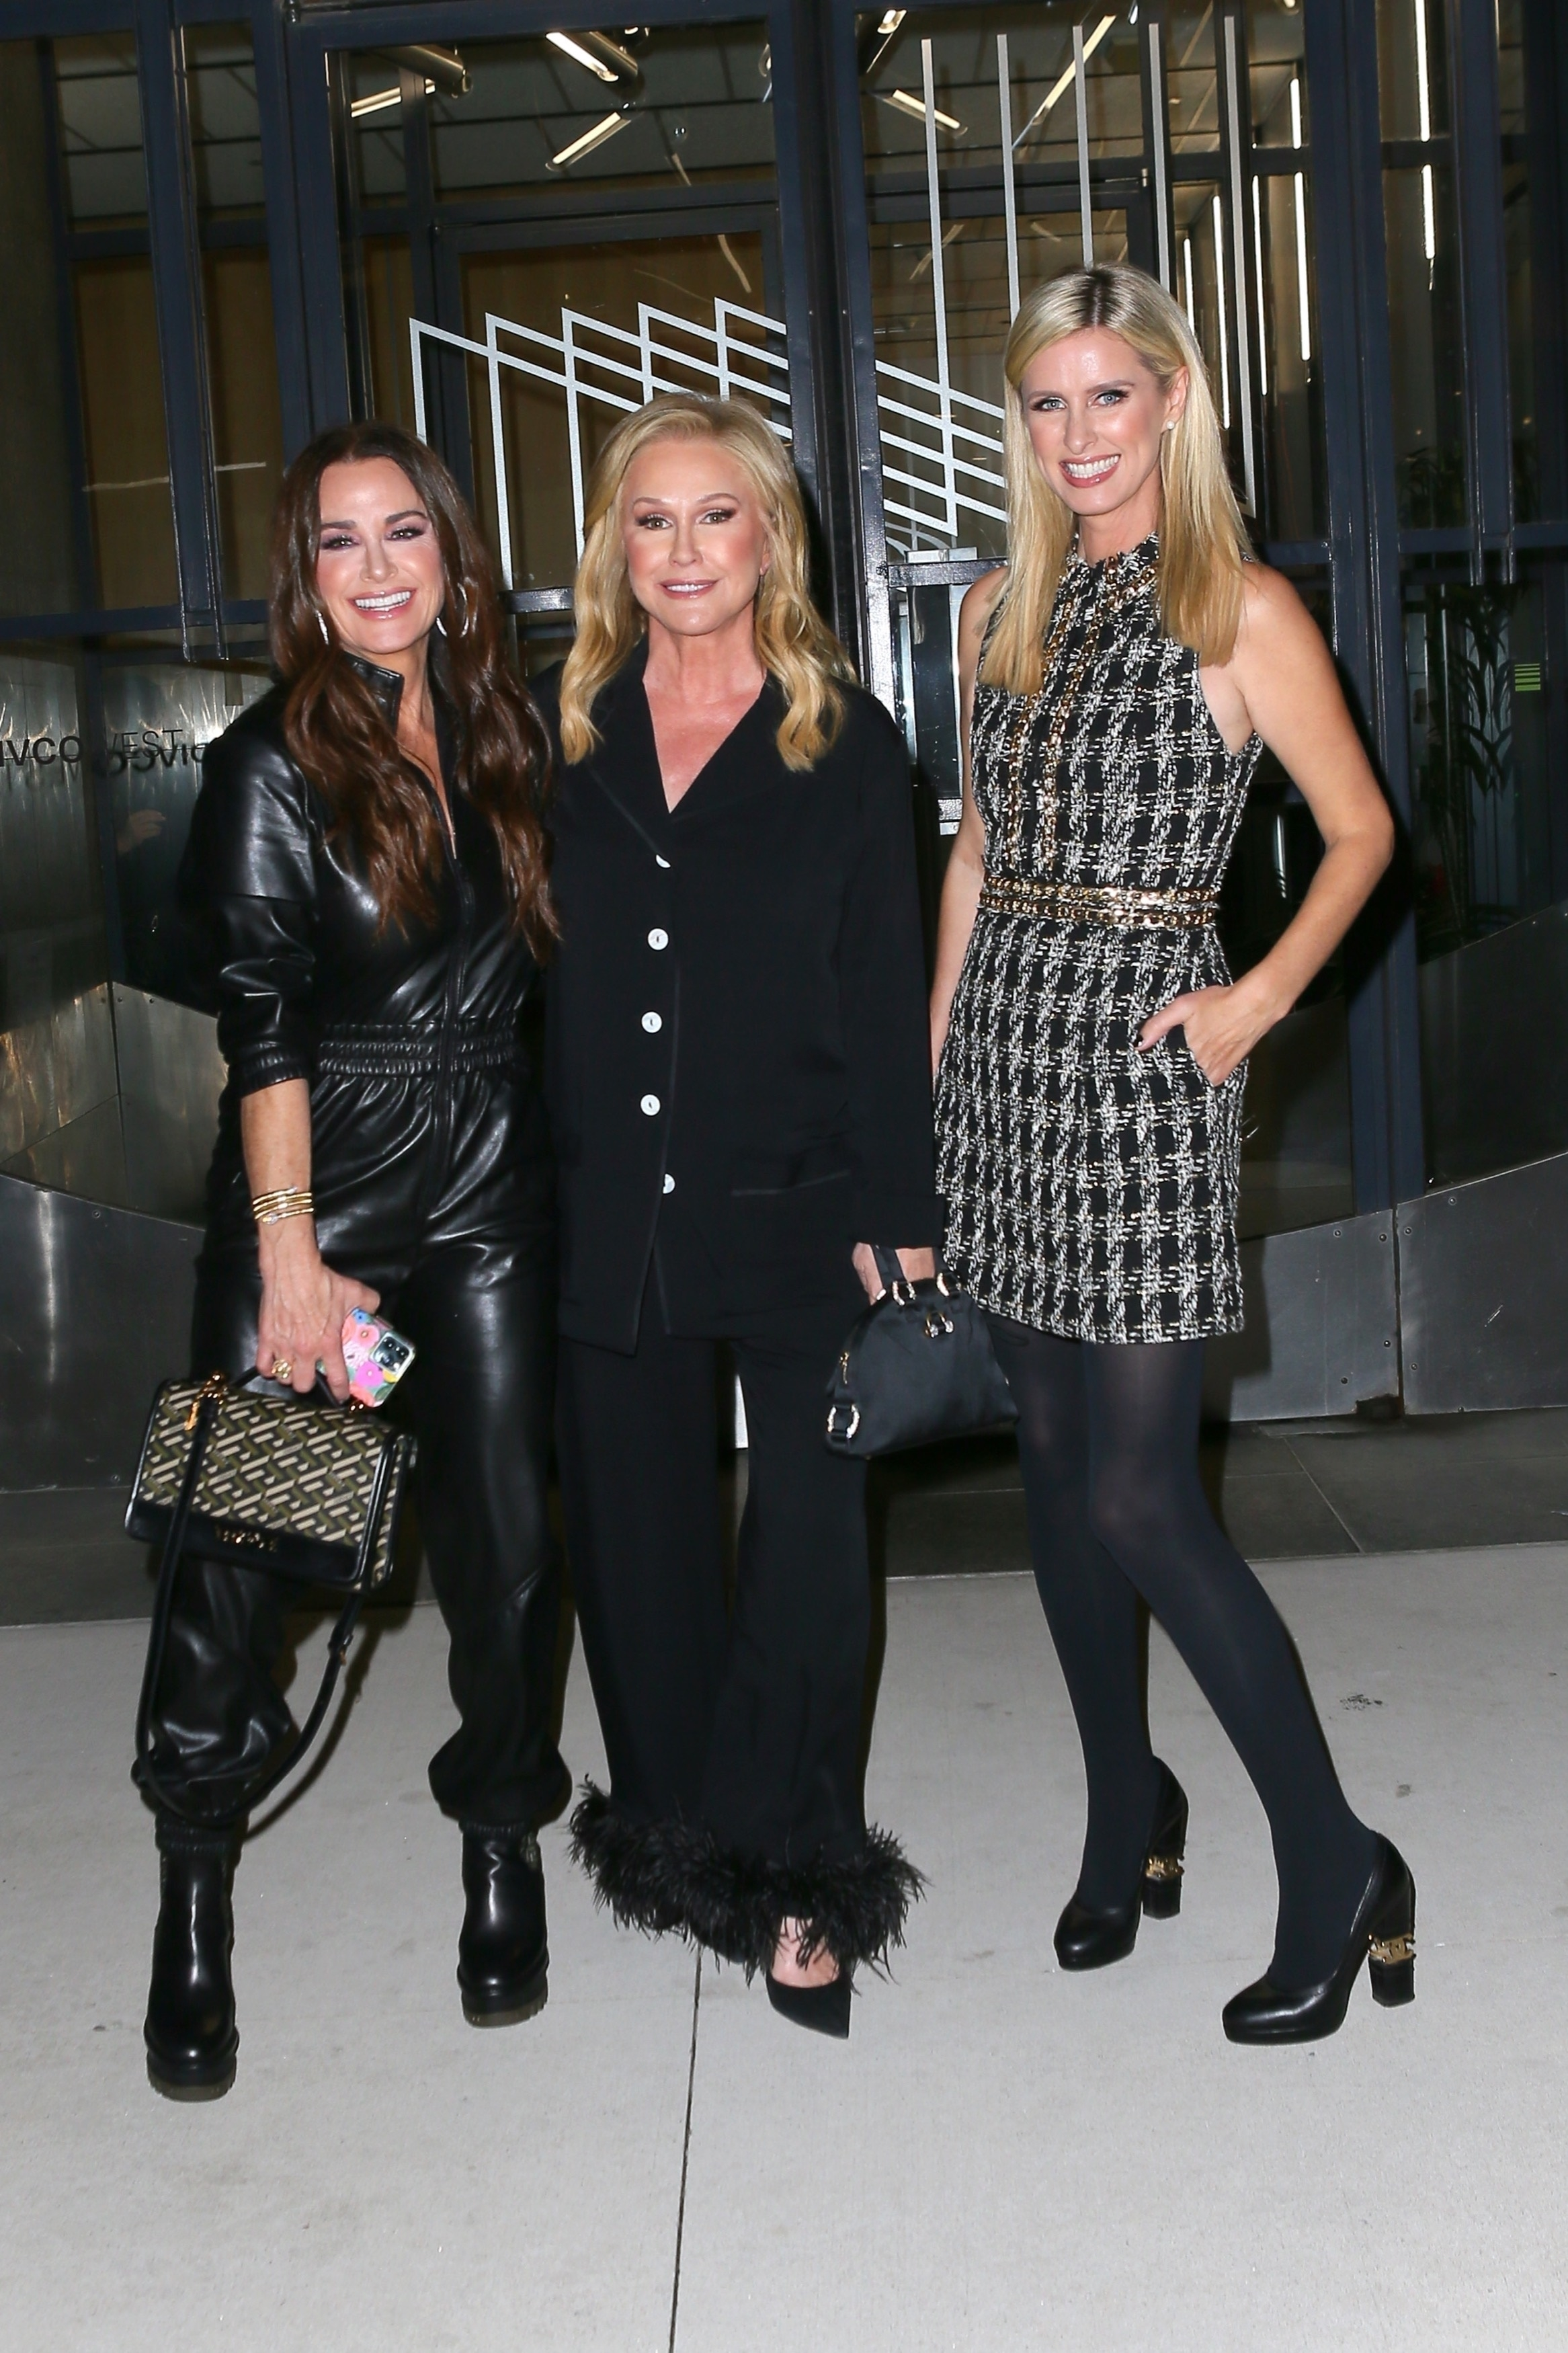 Kyle Richards, Kathy Hilton and Nicky Hilton